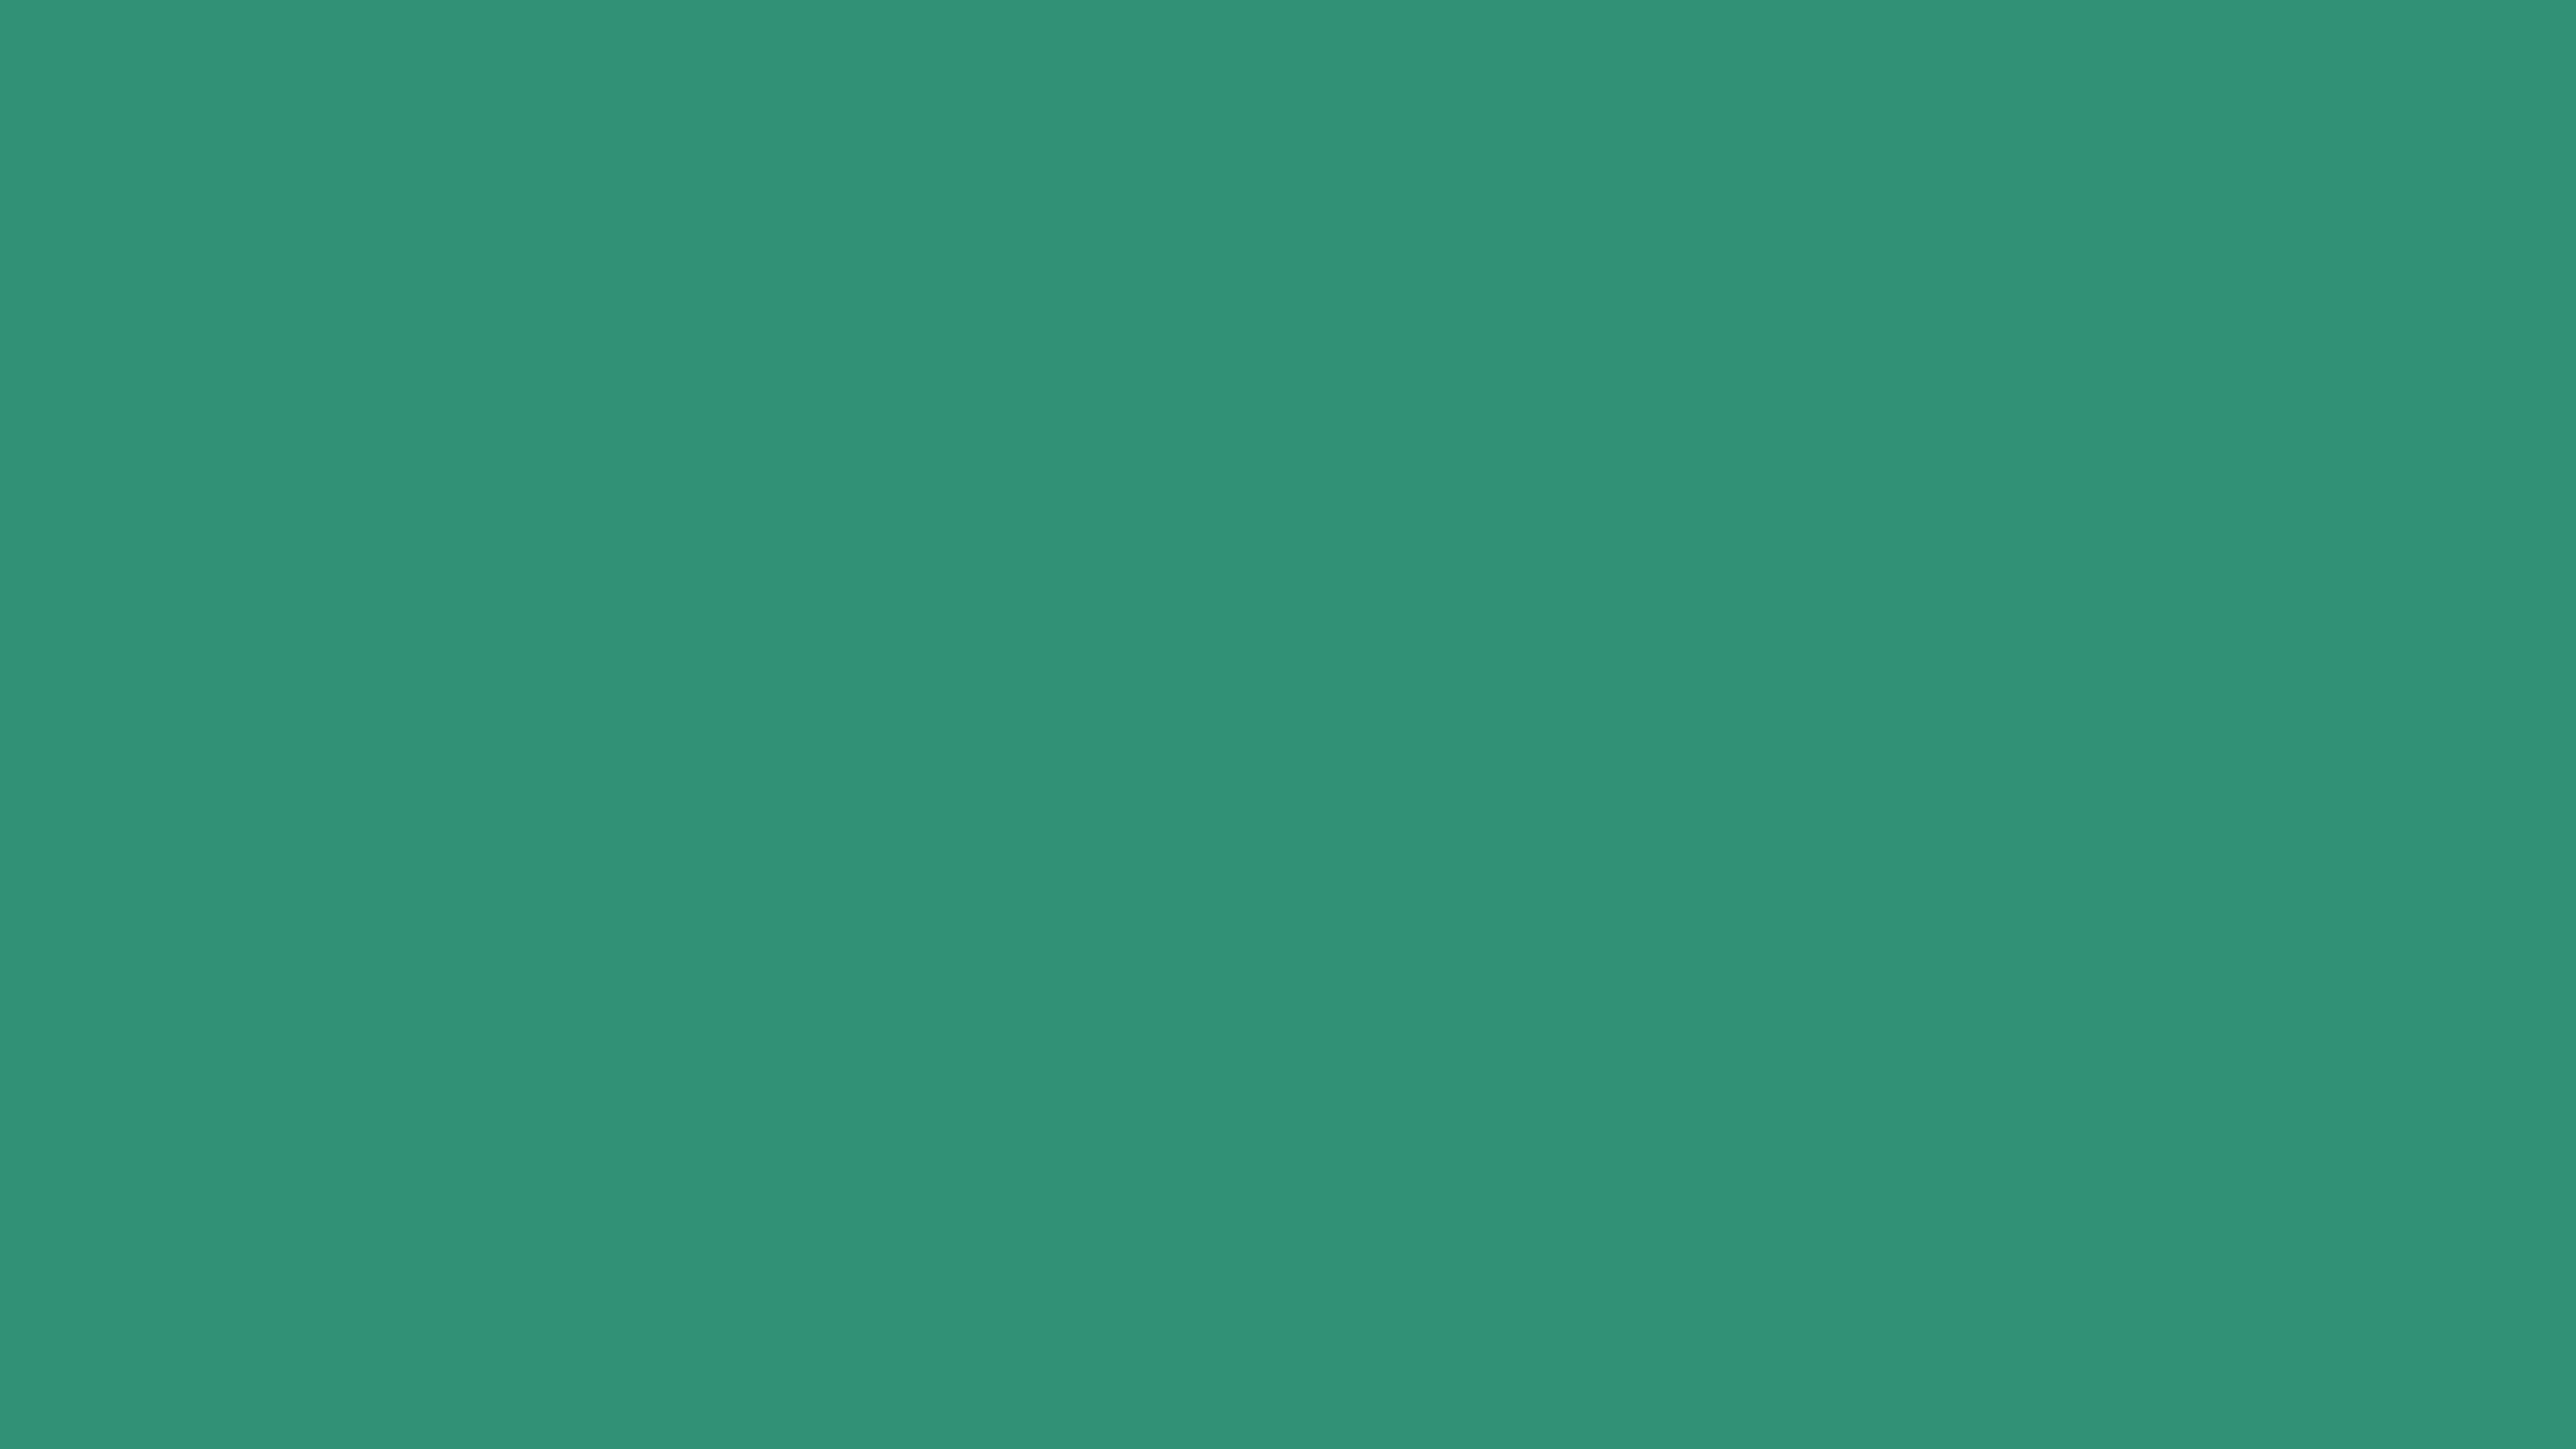 5120x2880 Illuminating Emerald Solid Color Background